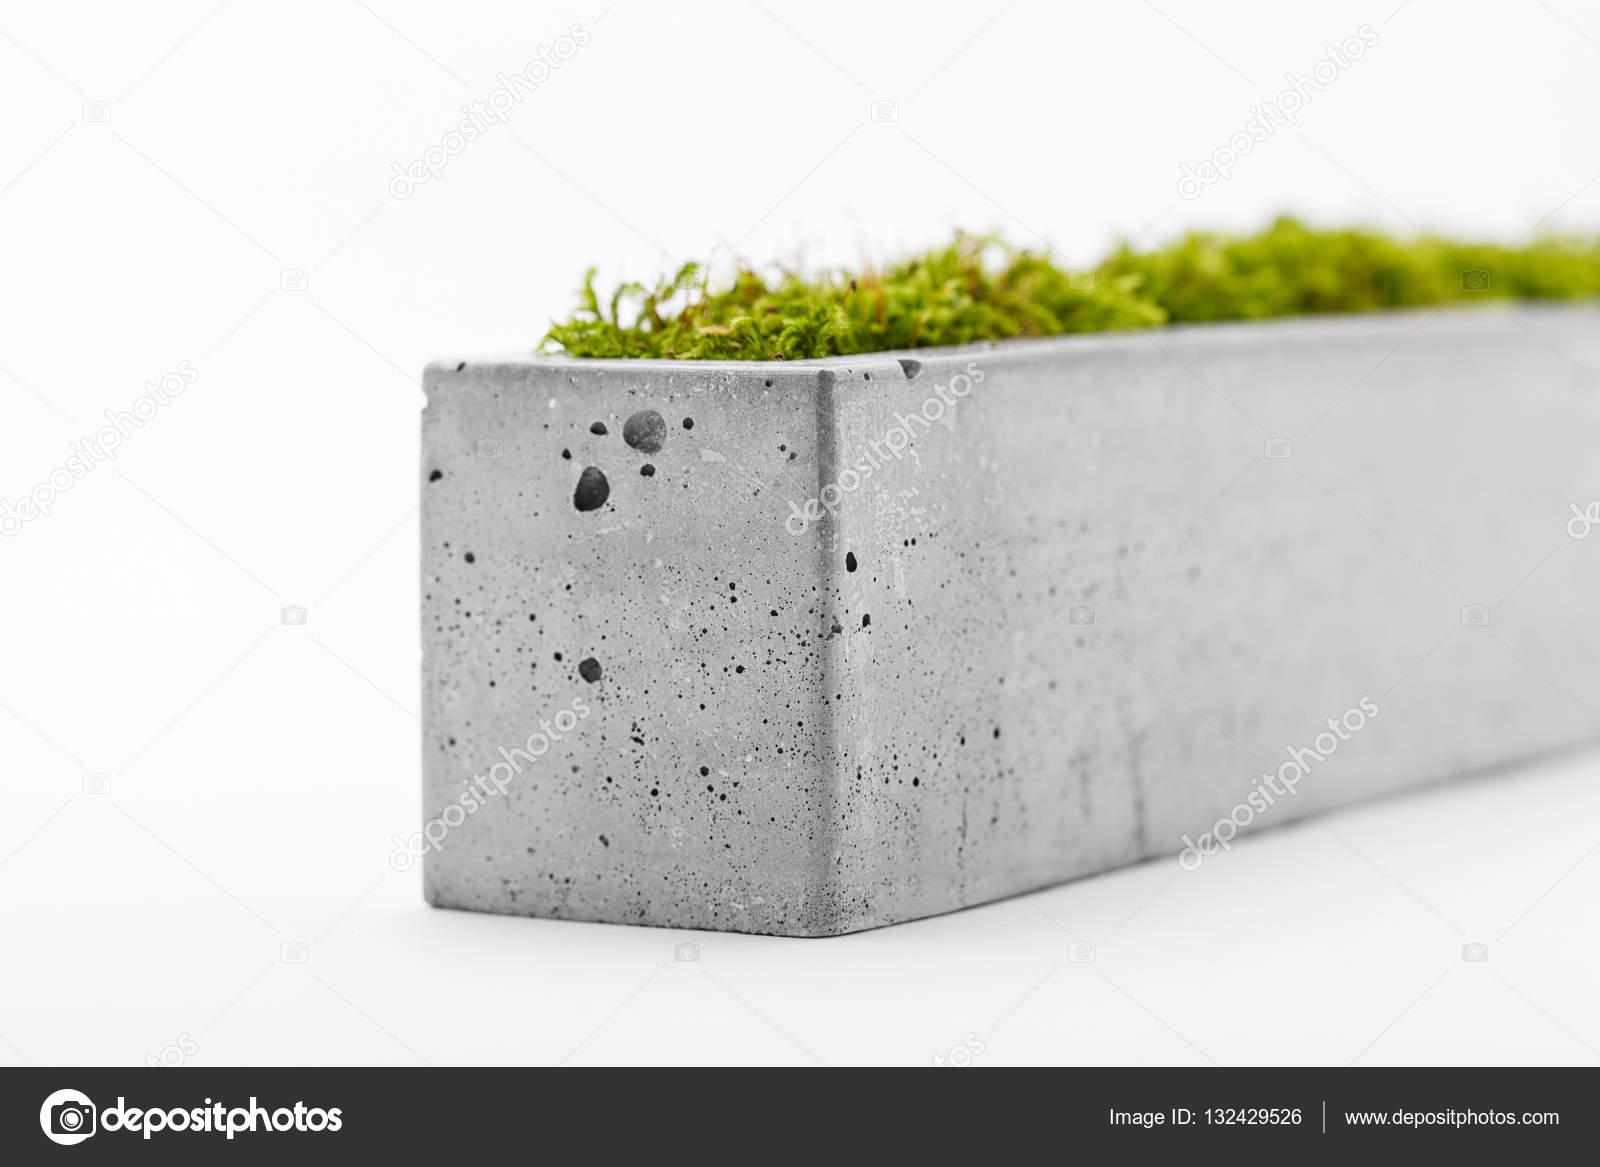 trendige topf beton — stockfoto © yuryrumovsky #132429526